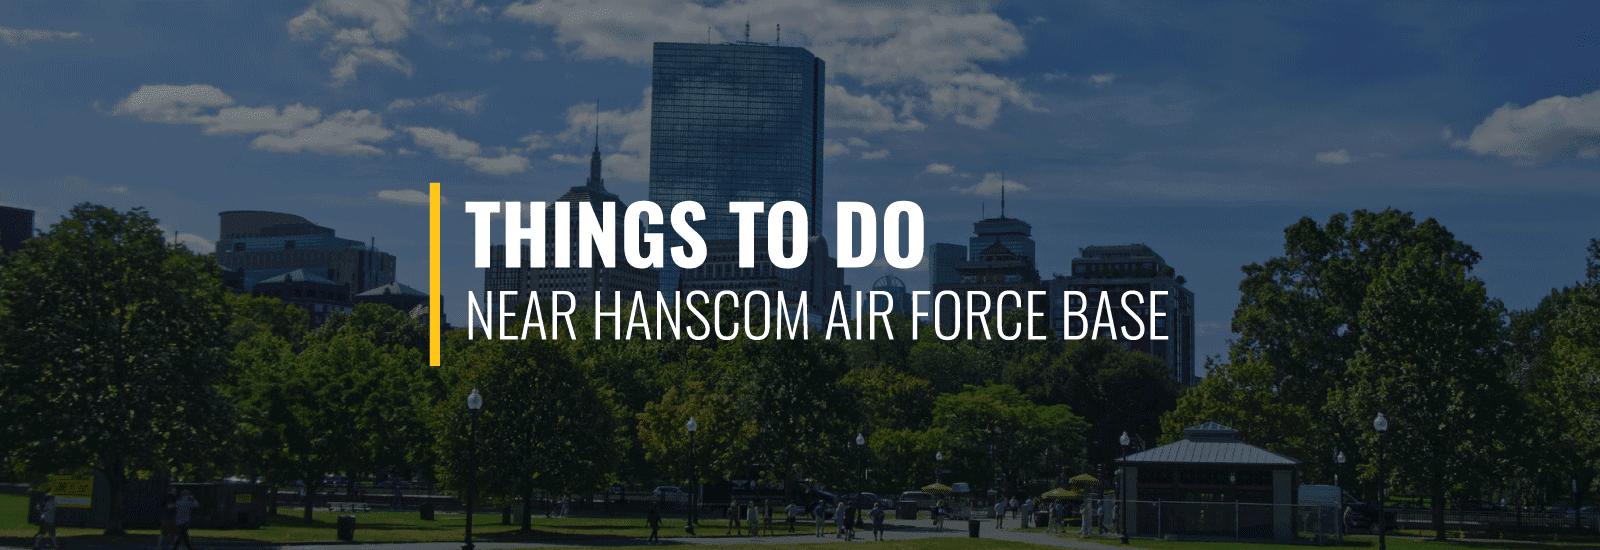 Things to Do Around Hanscom AFB